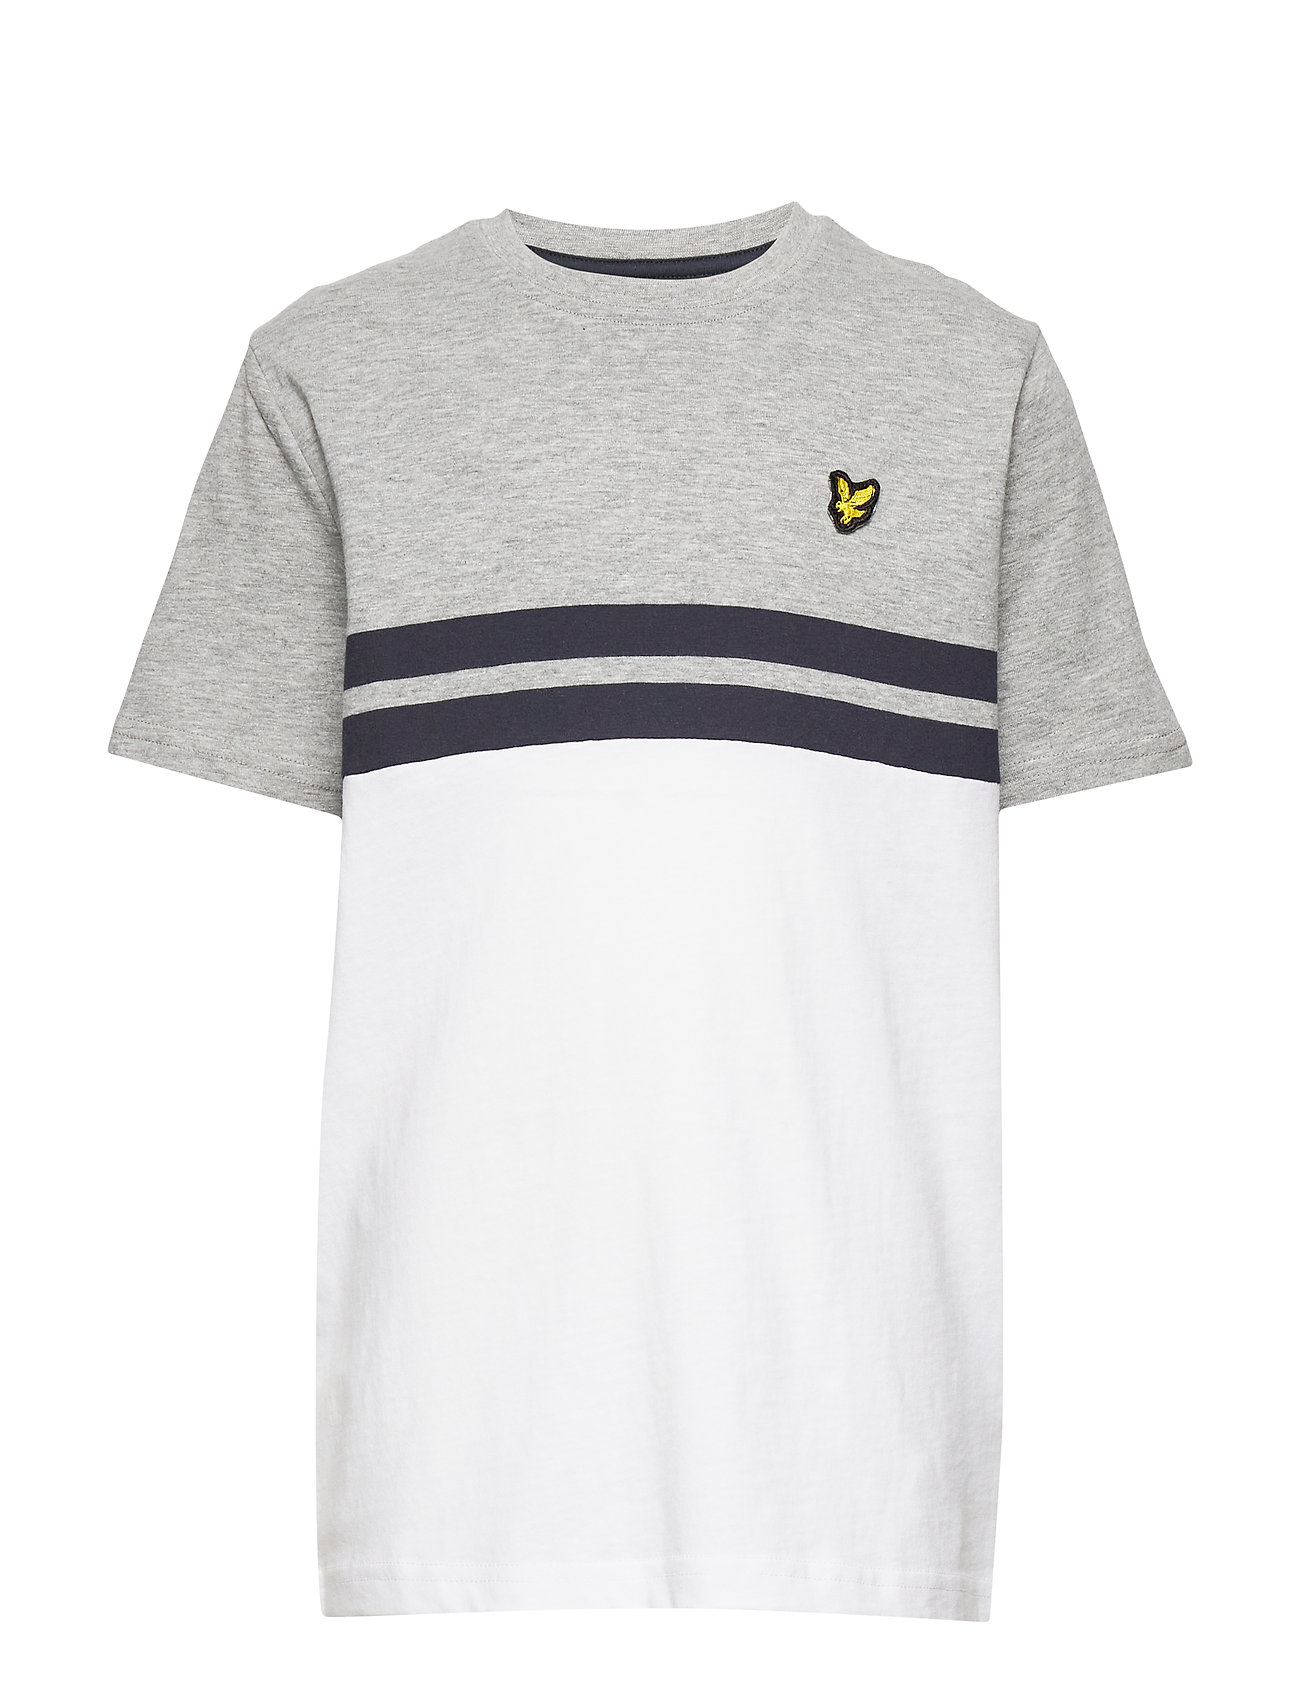 Lyle & Scott Junior Yoke Stripe T-Shirt Bright White - VINTAGE GREY HEATHER